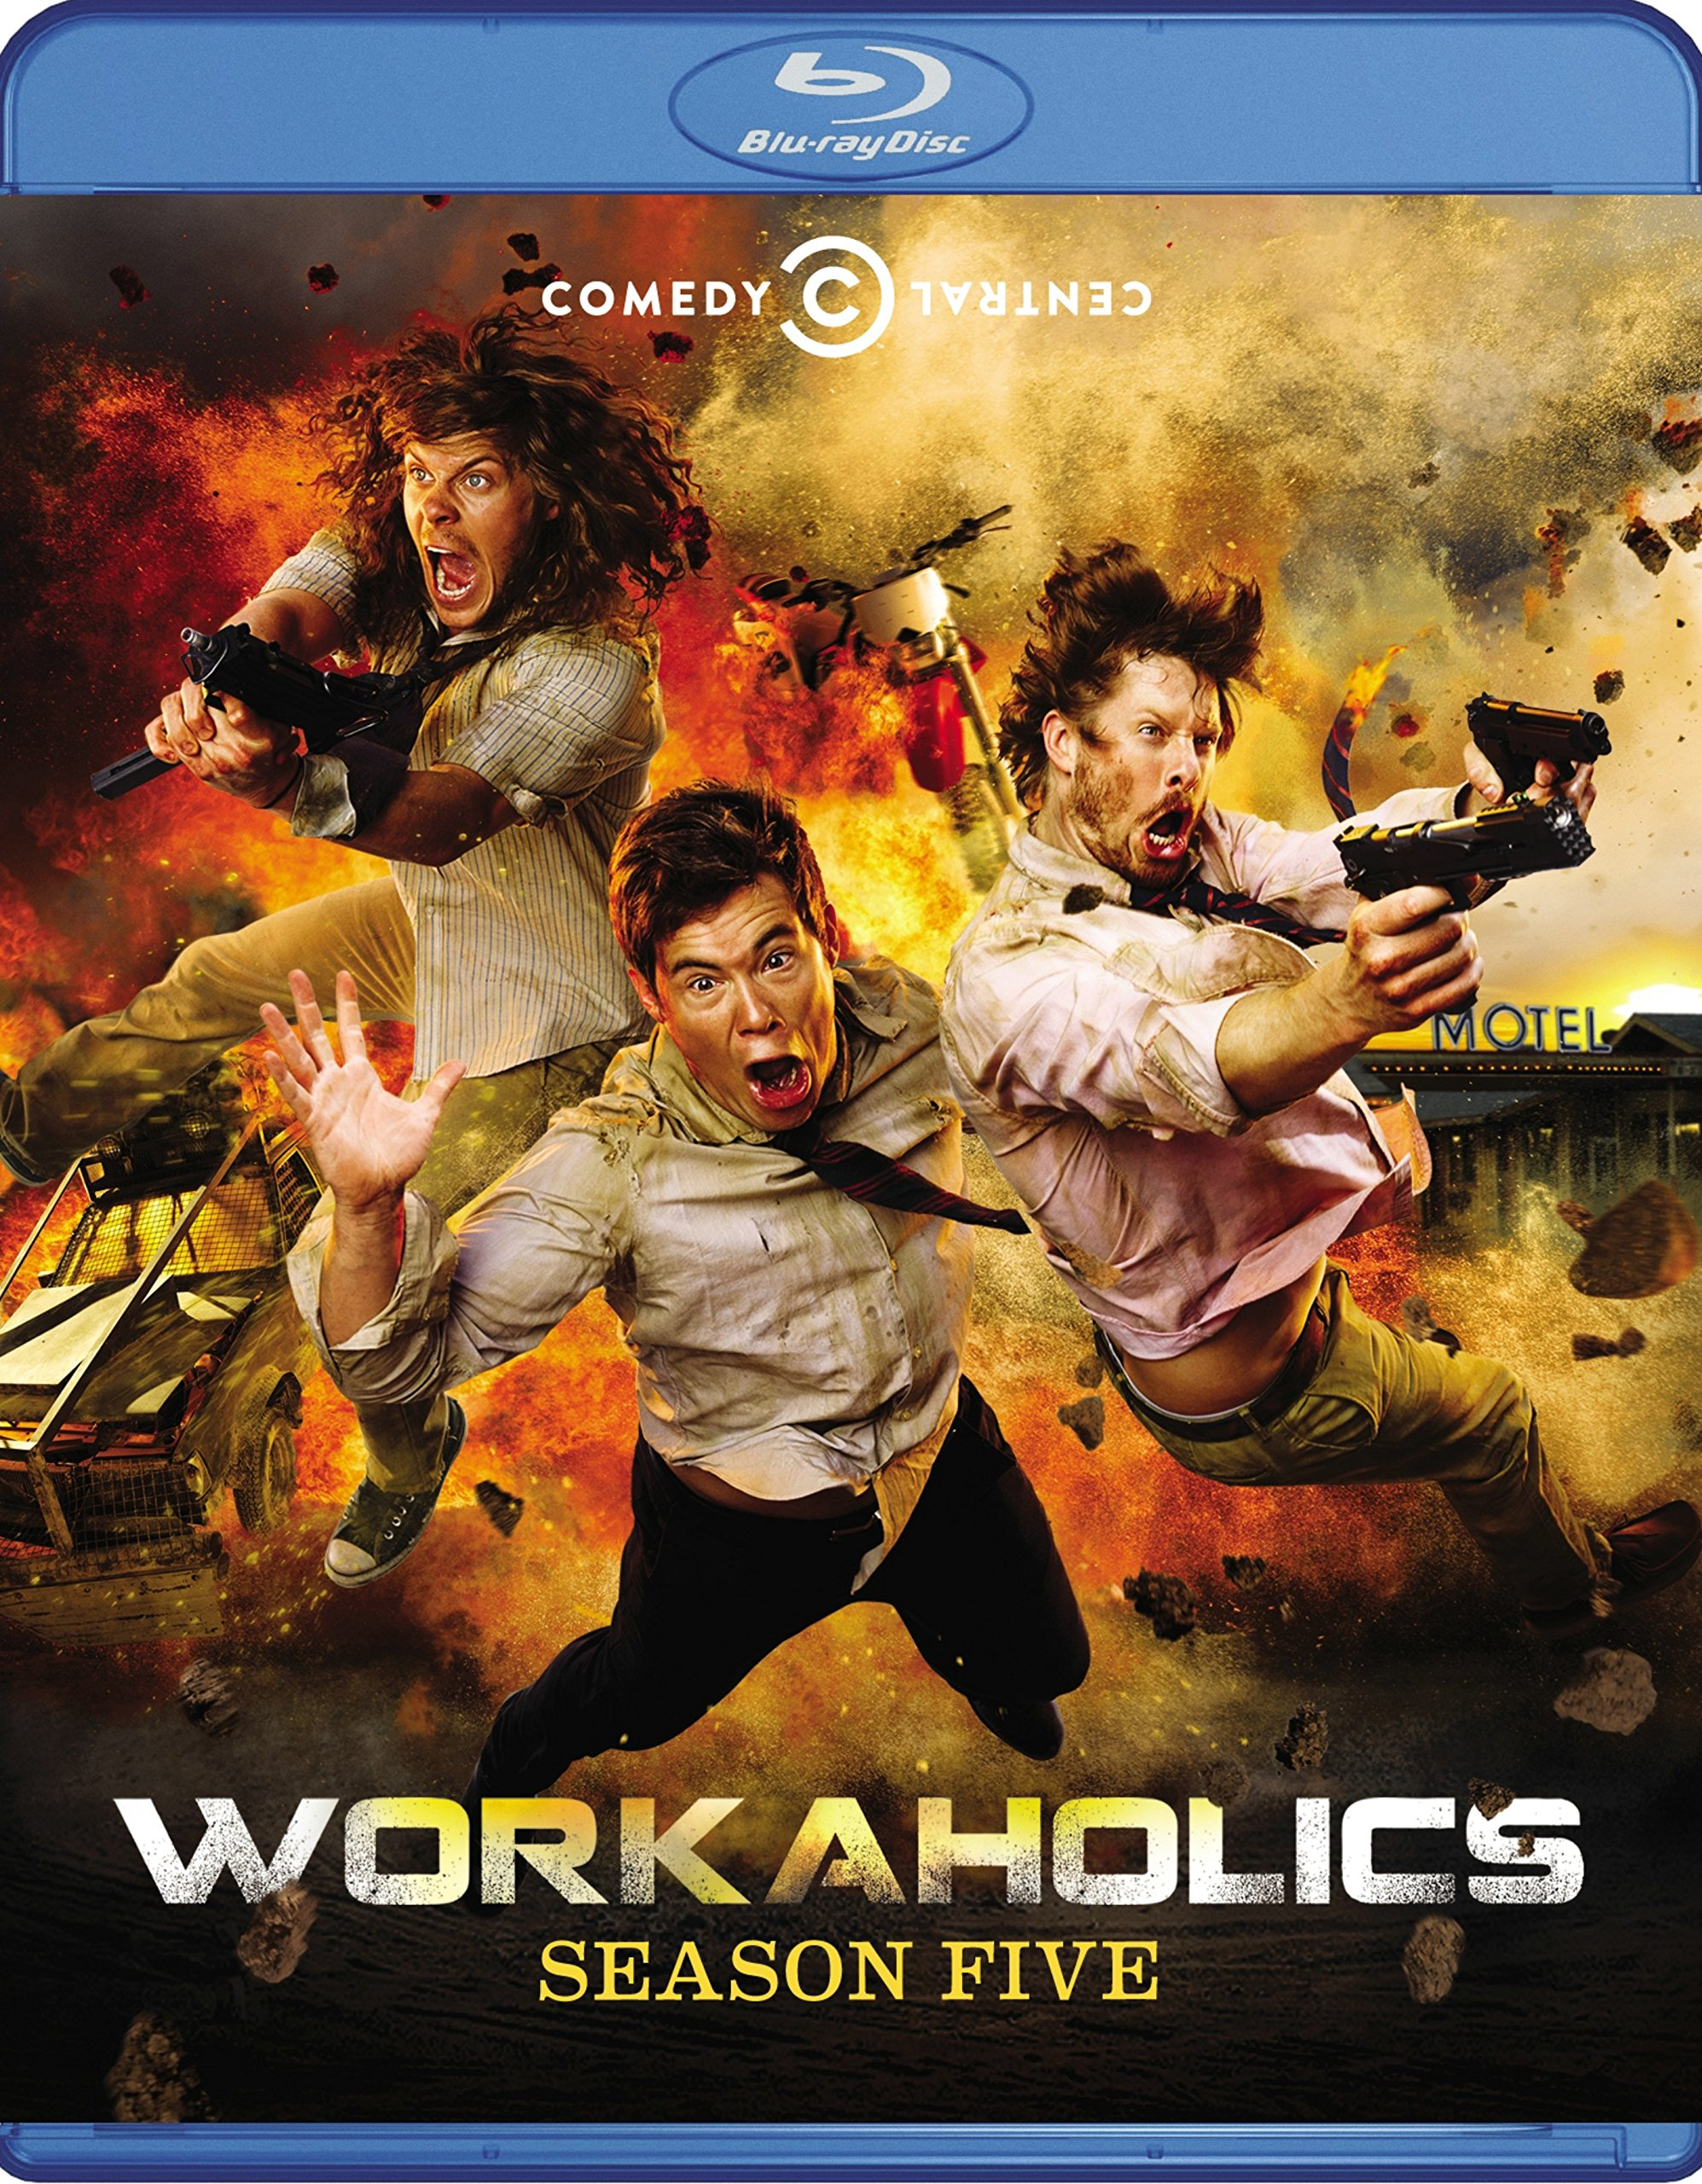 Workaholics Season 5  Blu-ray Review